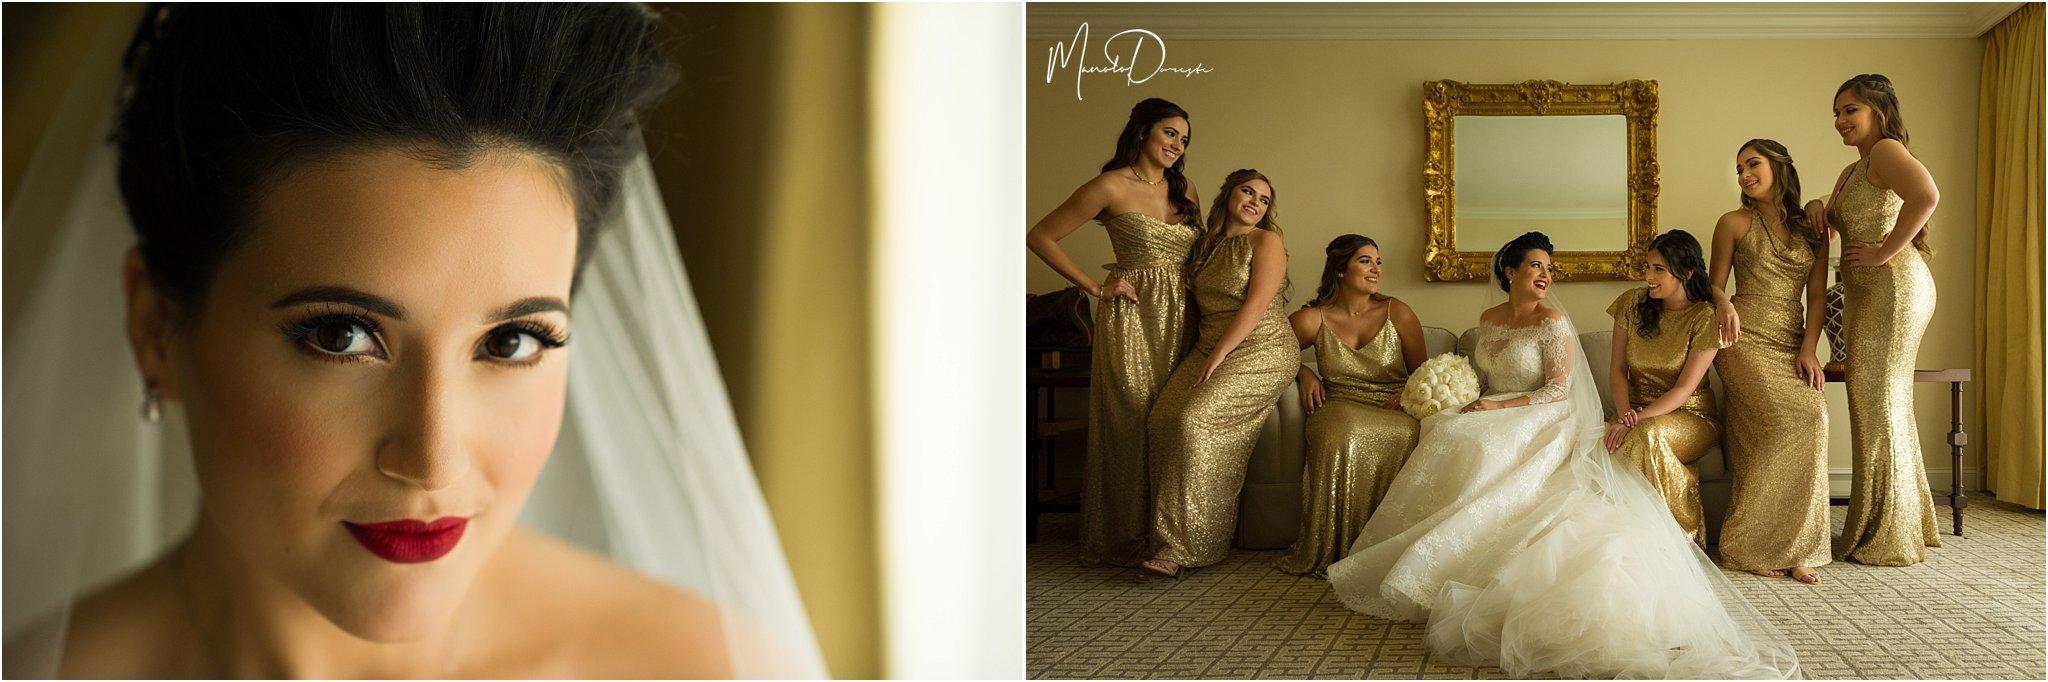 00955_ManoloDoreste_InFocusStudios_Wedding_Family_Photography_Miami_MiamiPhotographer.jpg